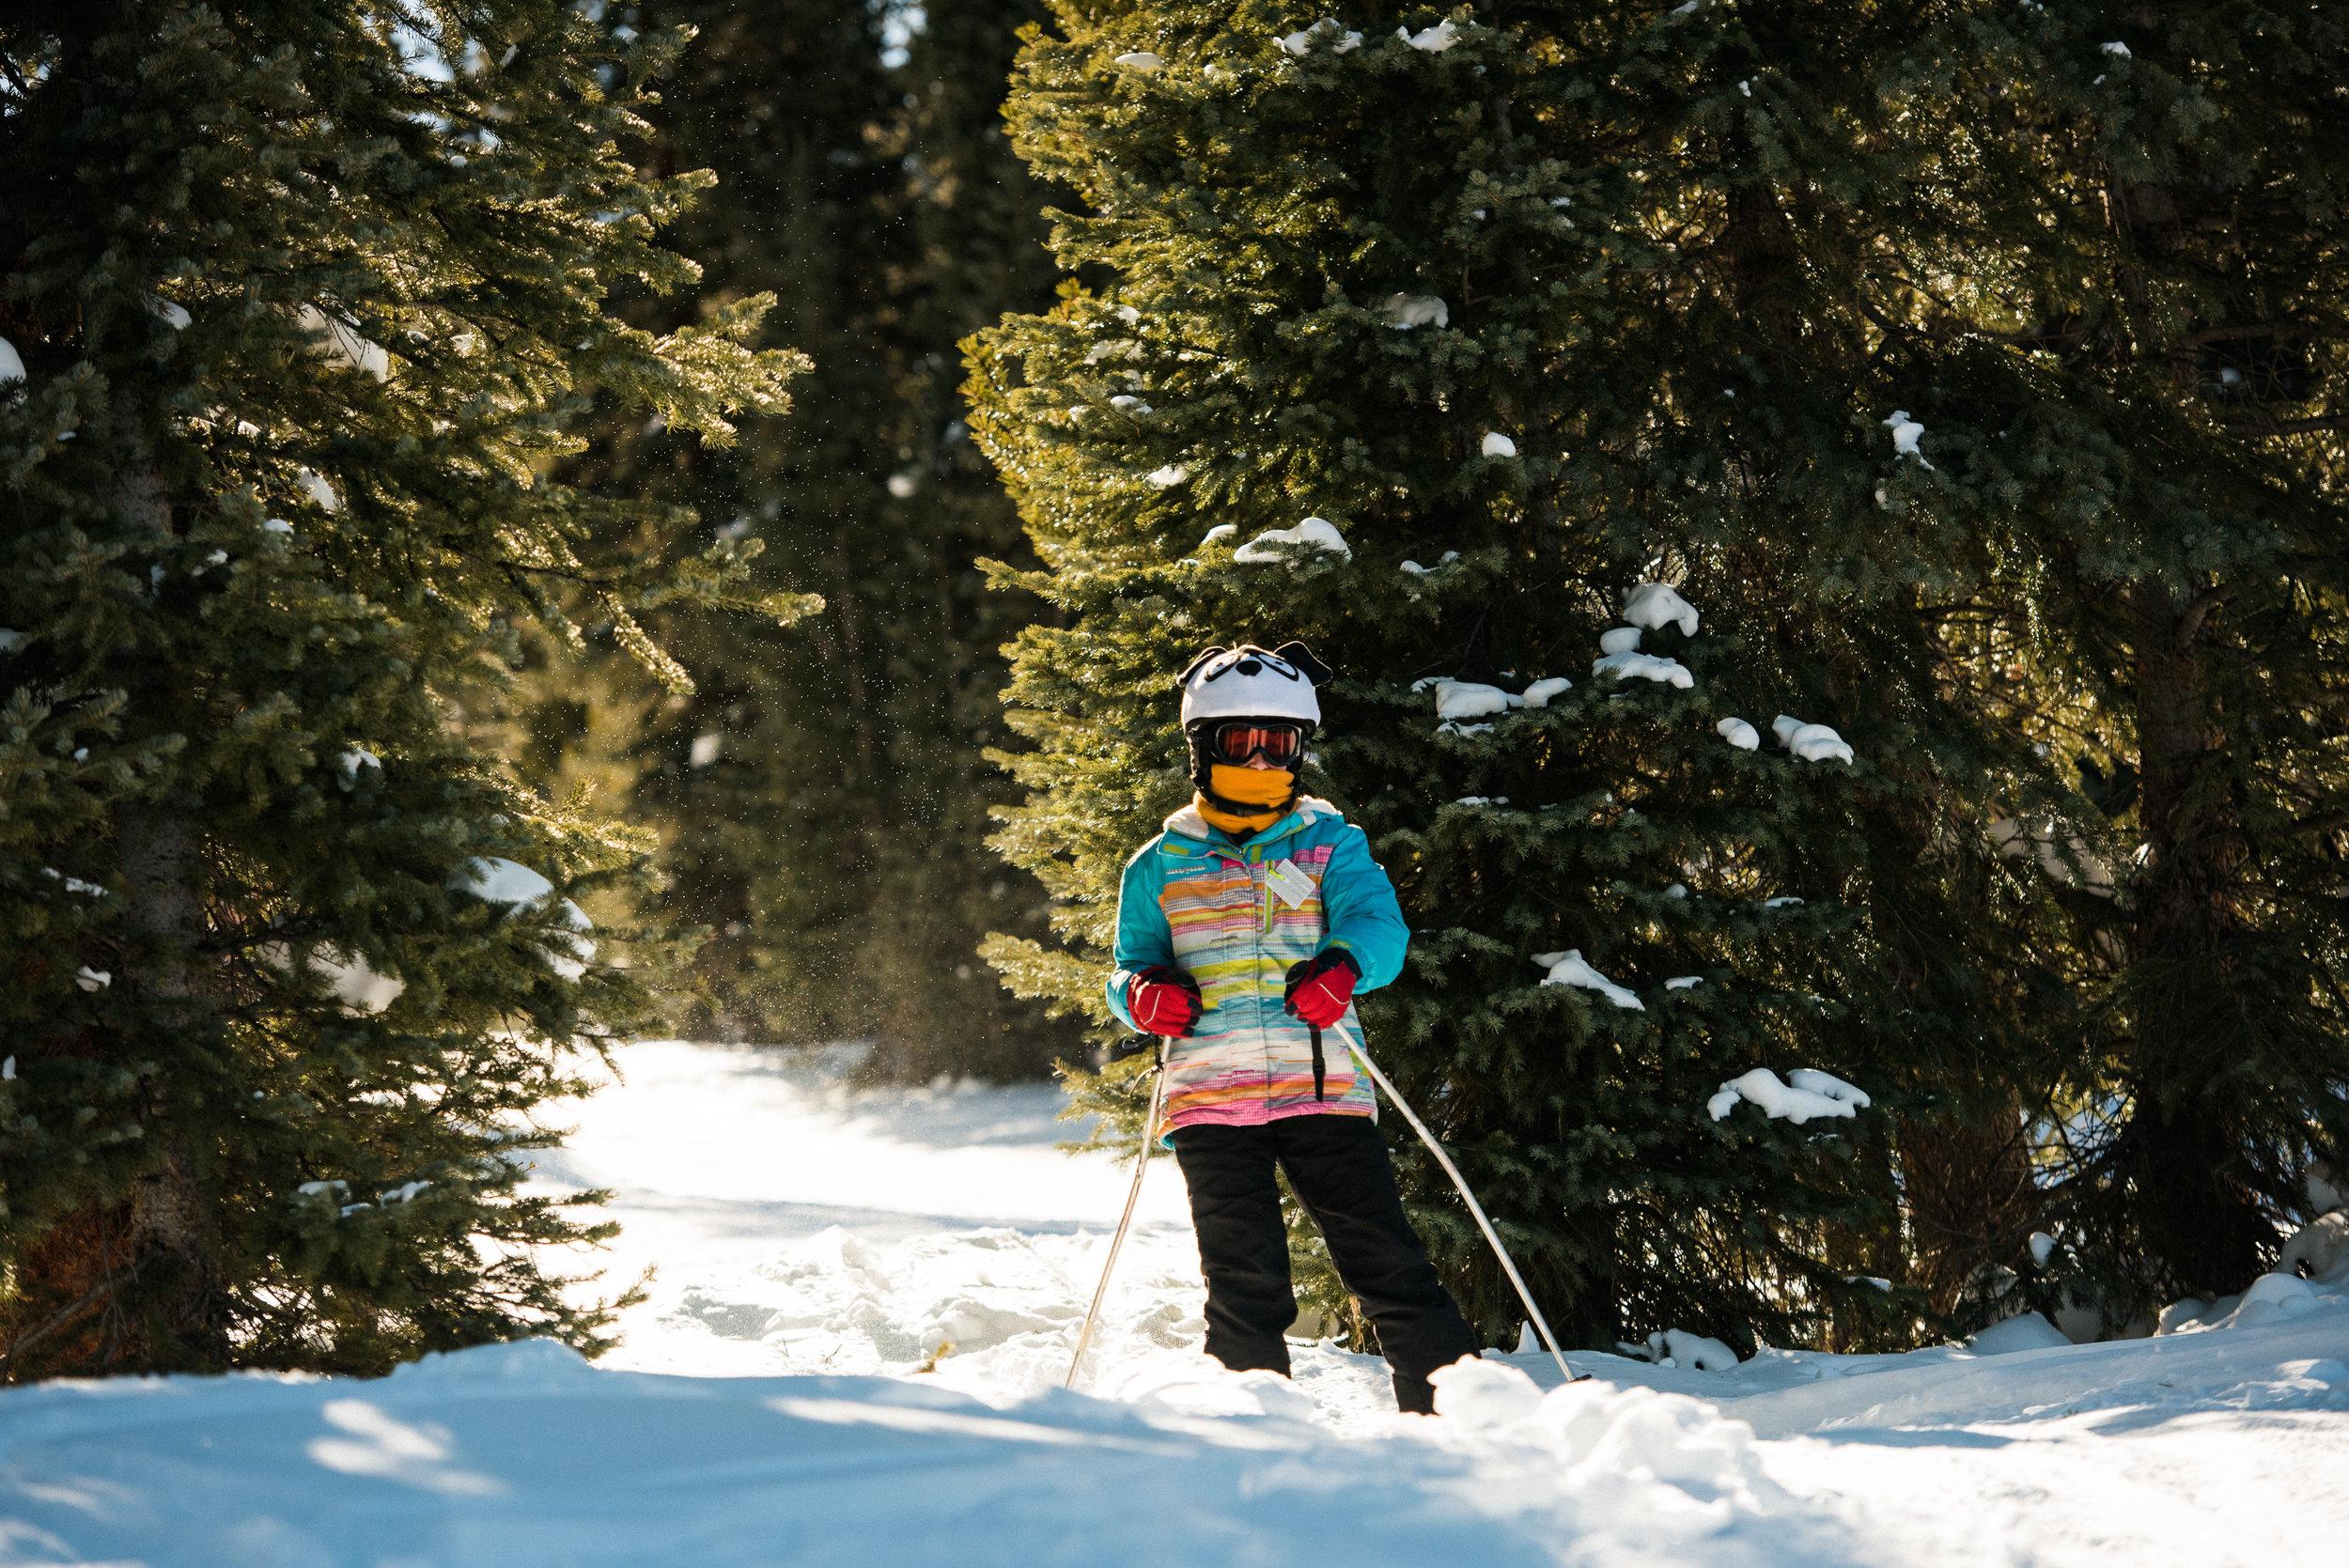 TaraShupe_Outdoor_Photographer_Loweprobags_Colorado_Copper_Mountains_Ski_37.jpg